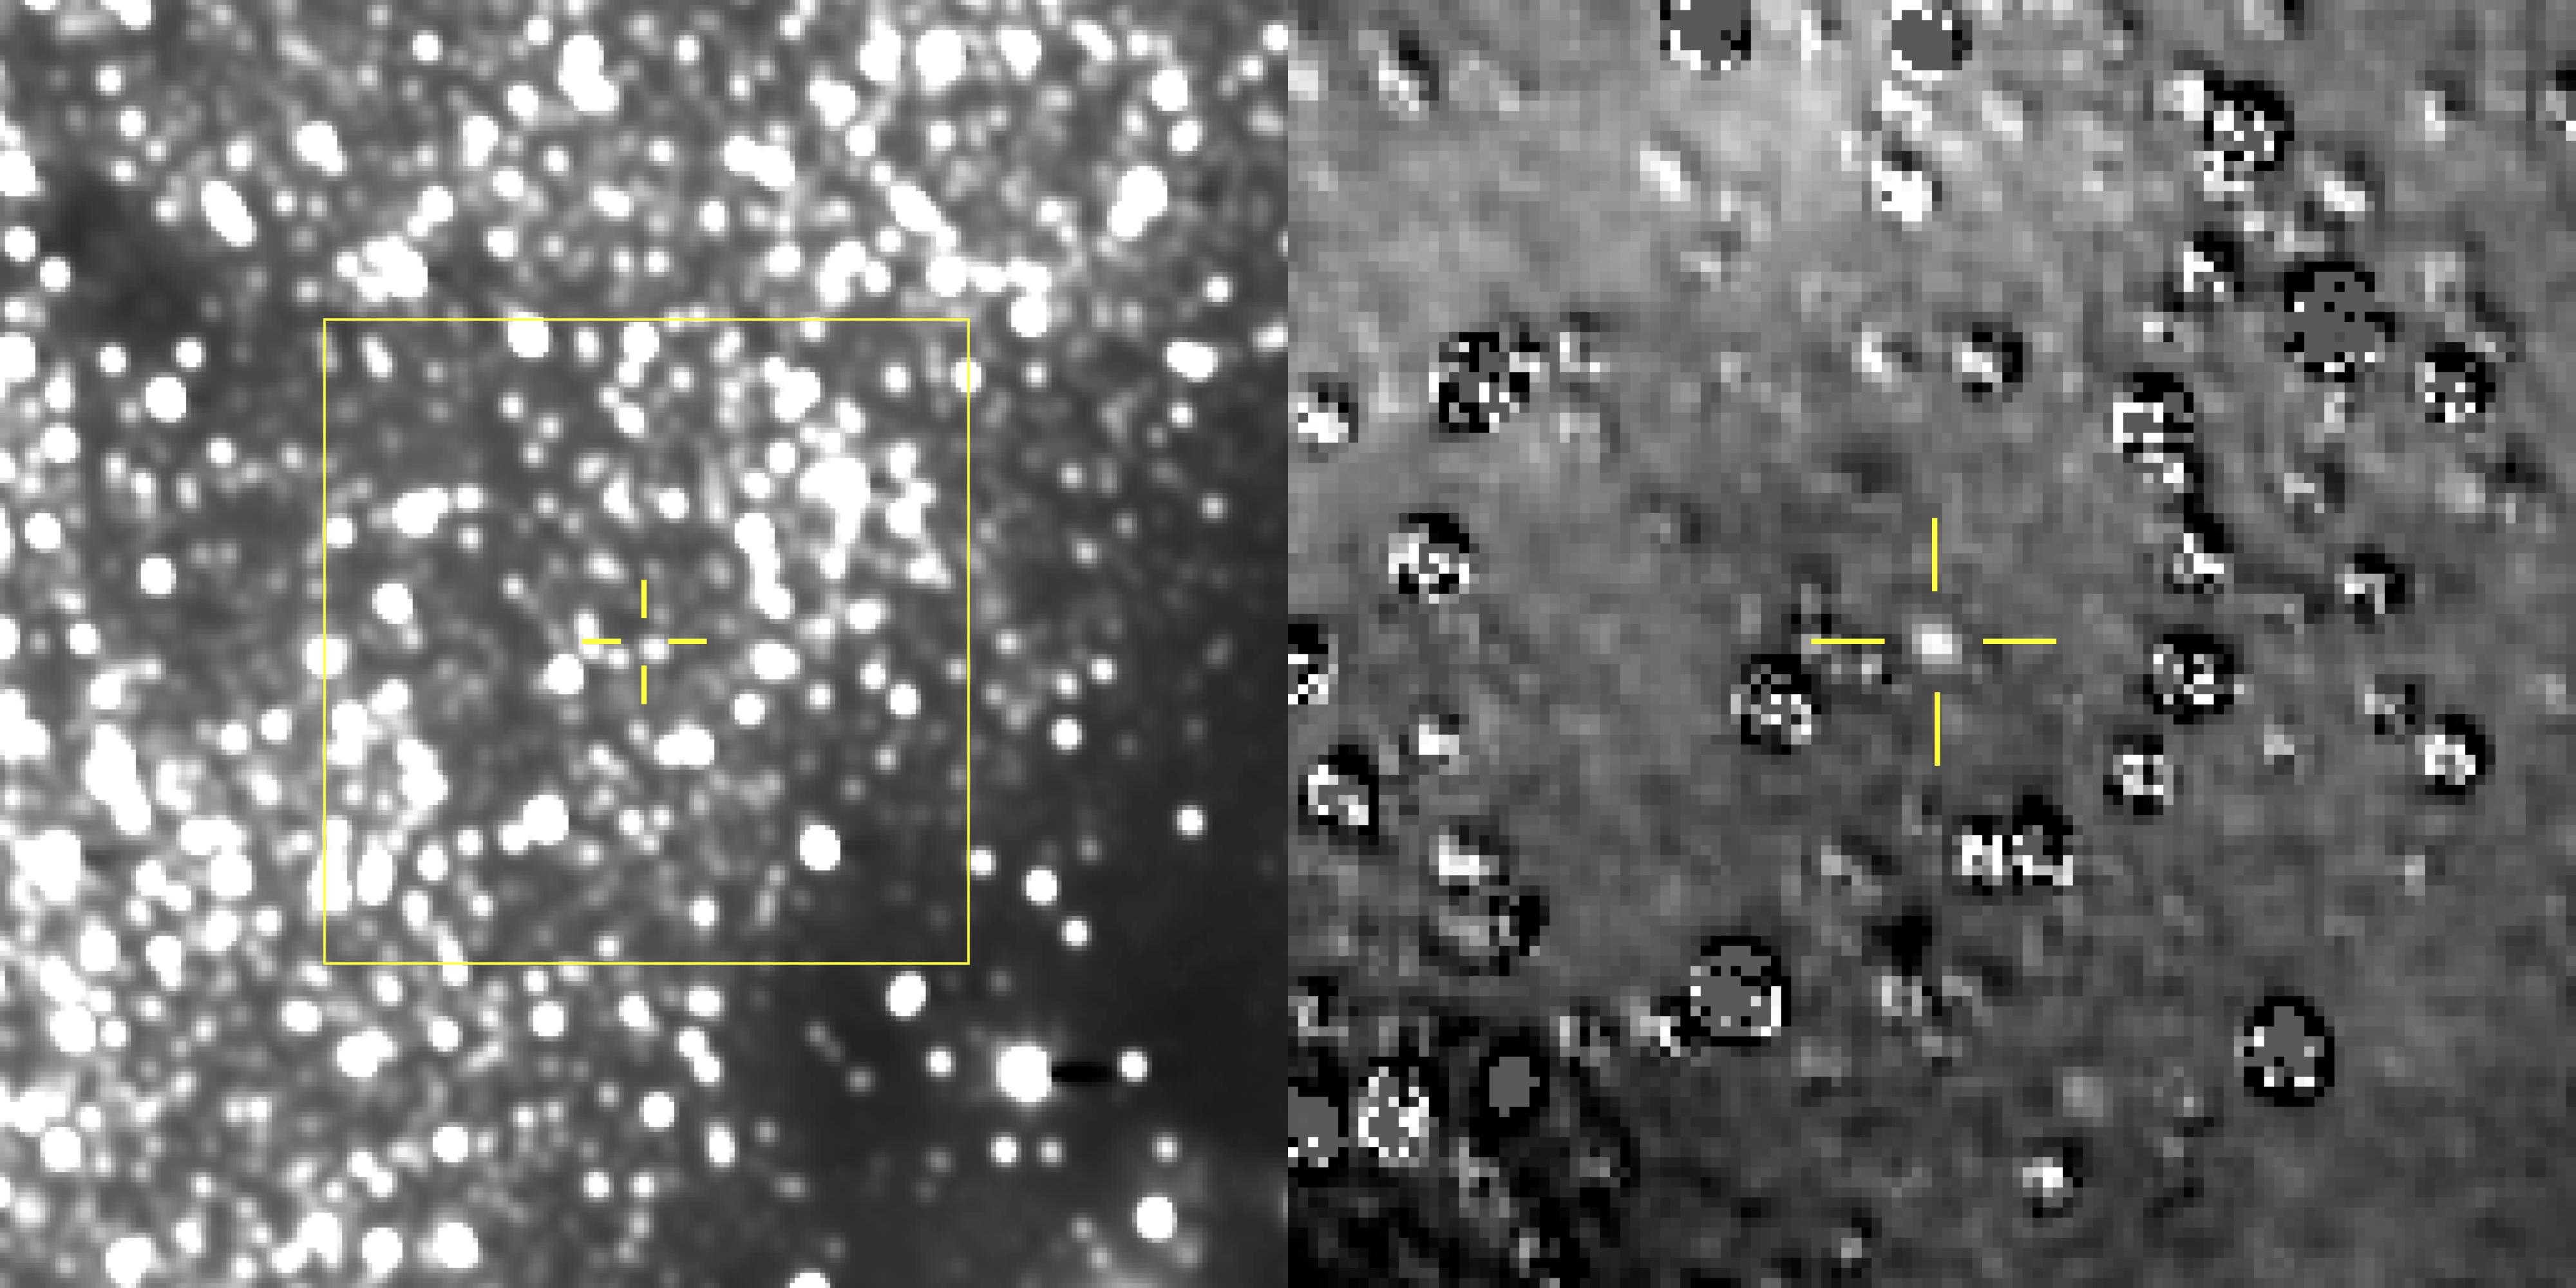 NASA's New Horizons Makes First Detection of Kuiper Belt